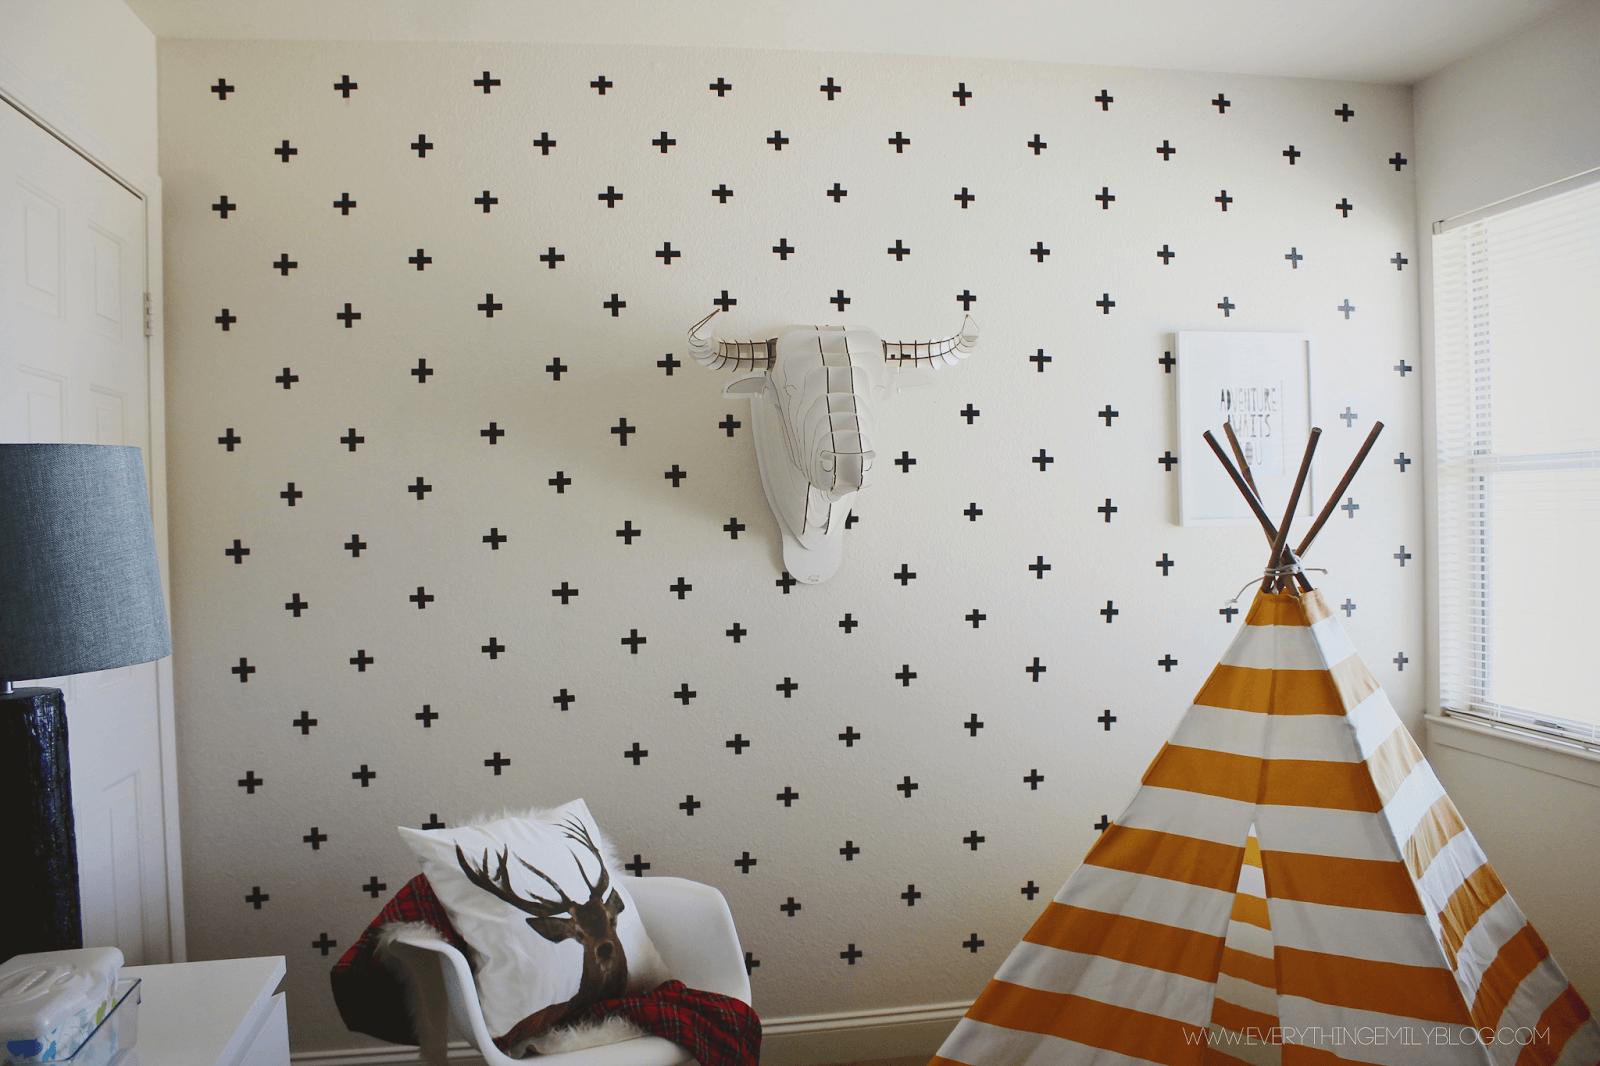 decoração com fita adesiva sala